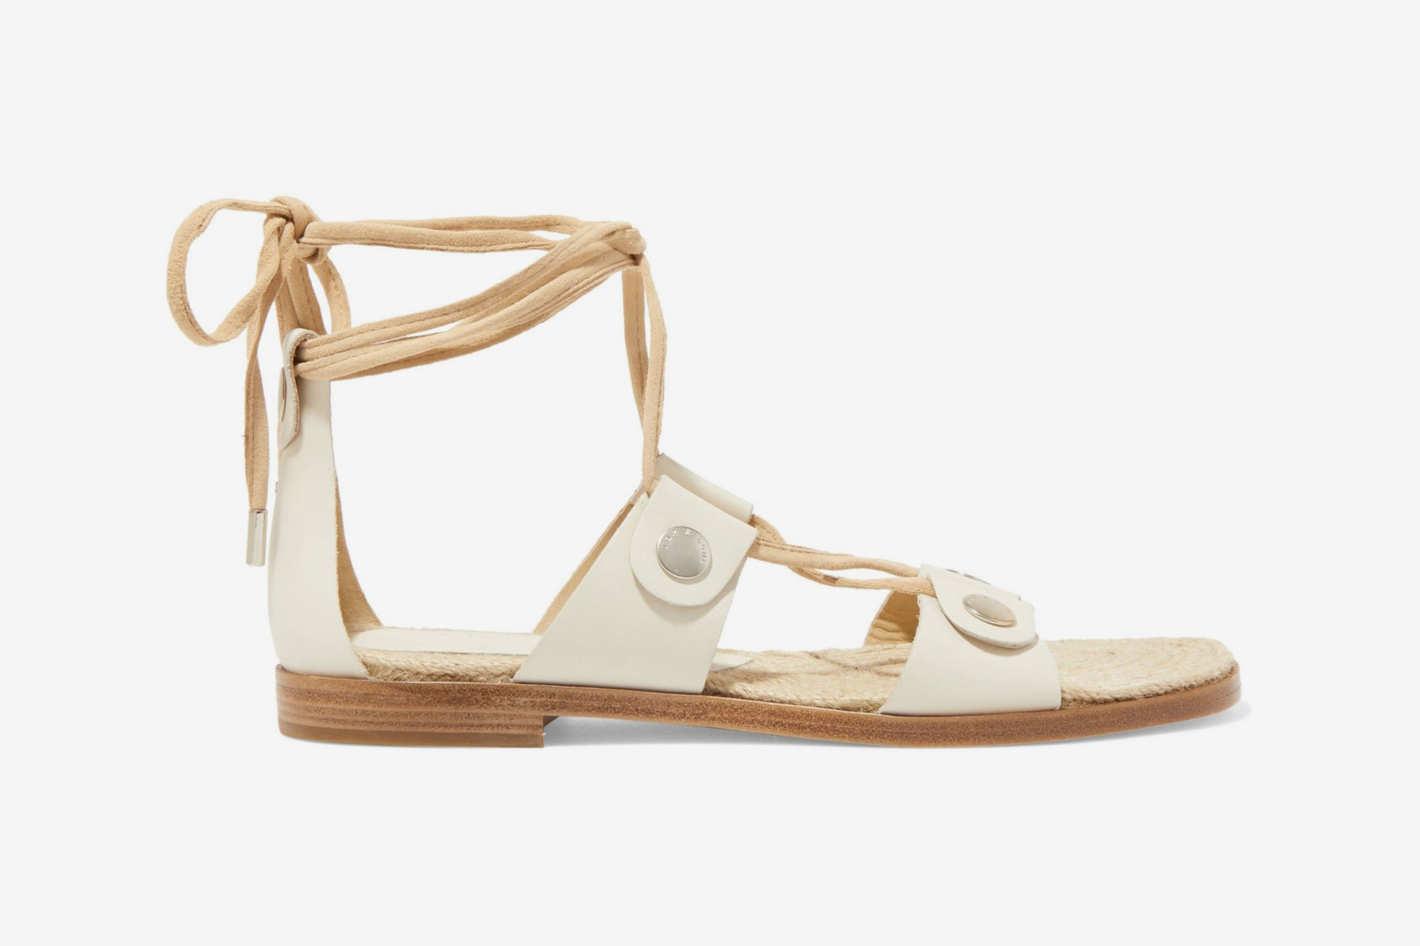 Rag & Bone Suede Trimmed Leather Sandals